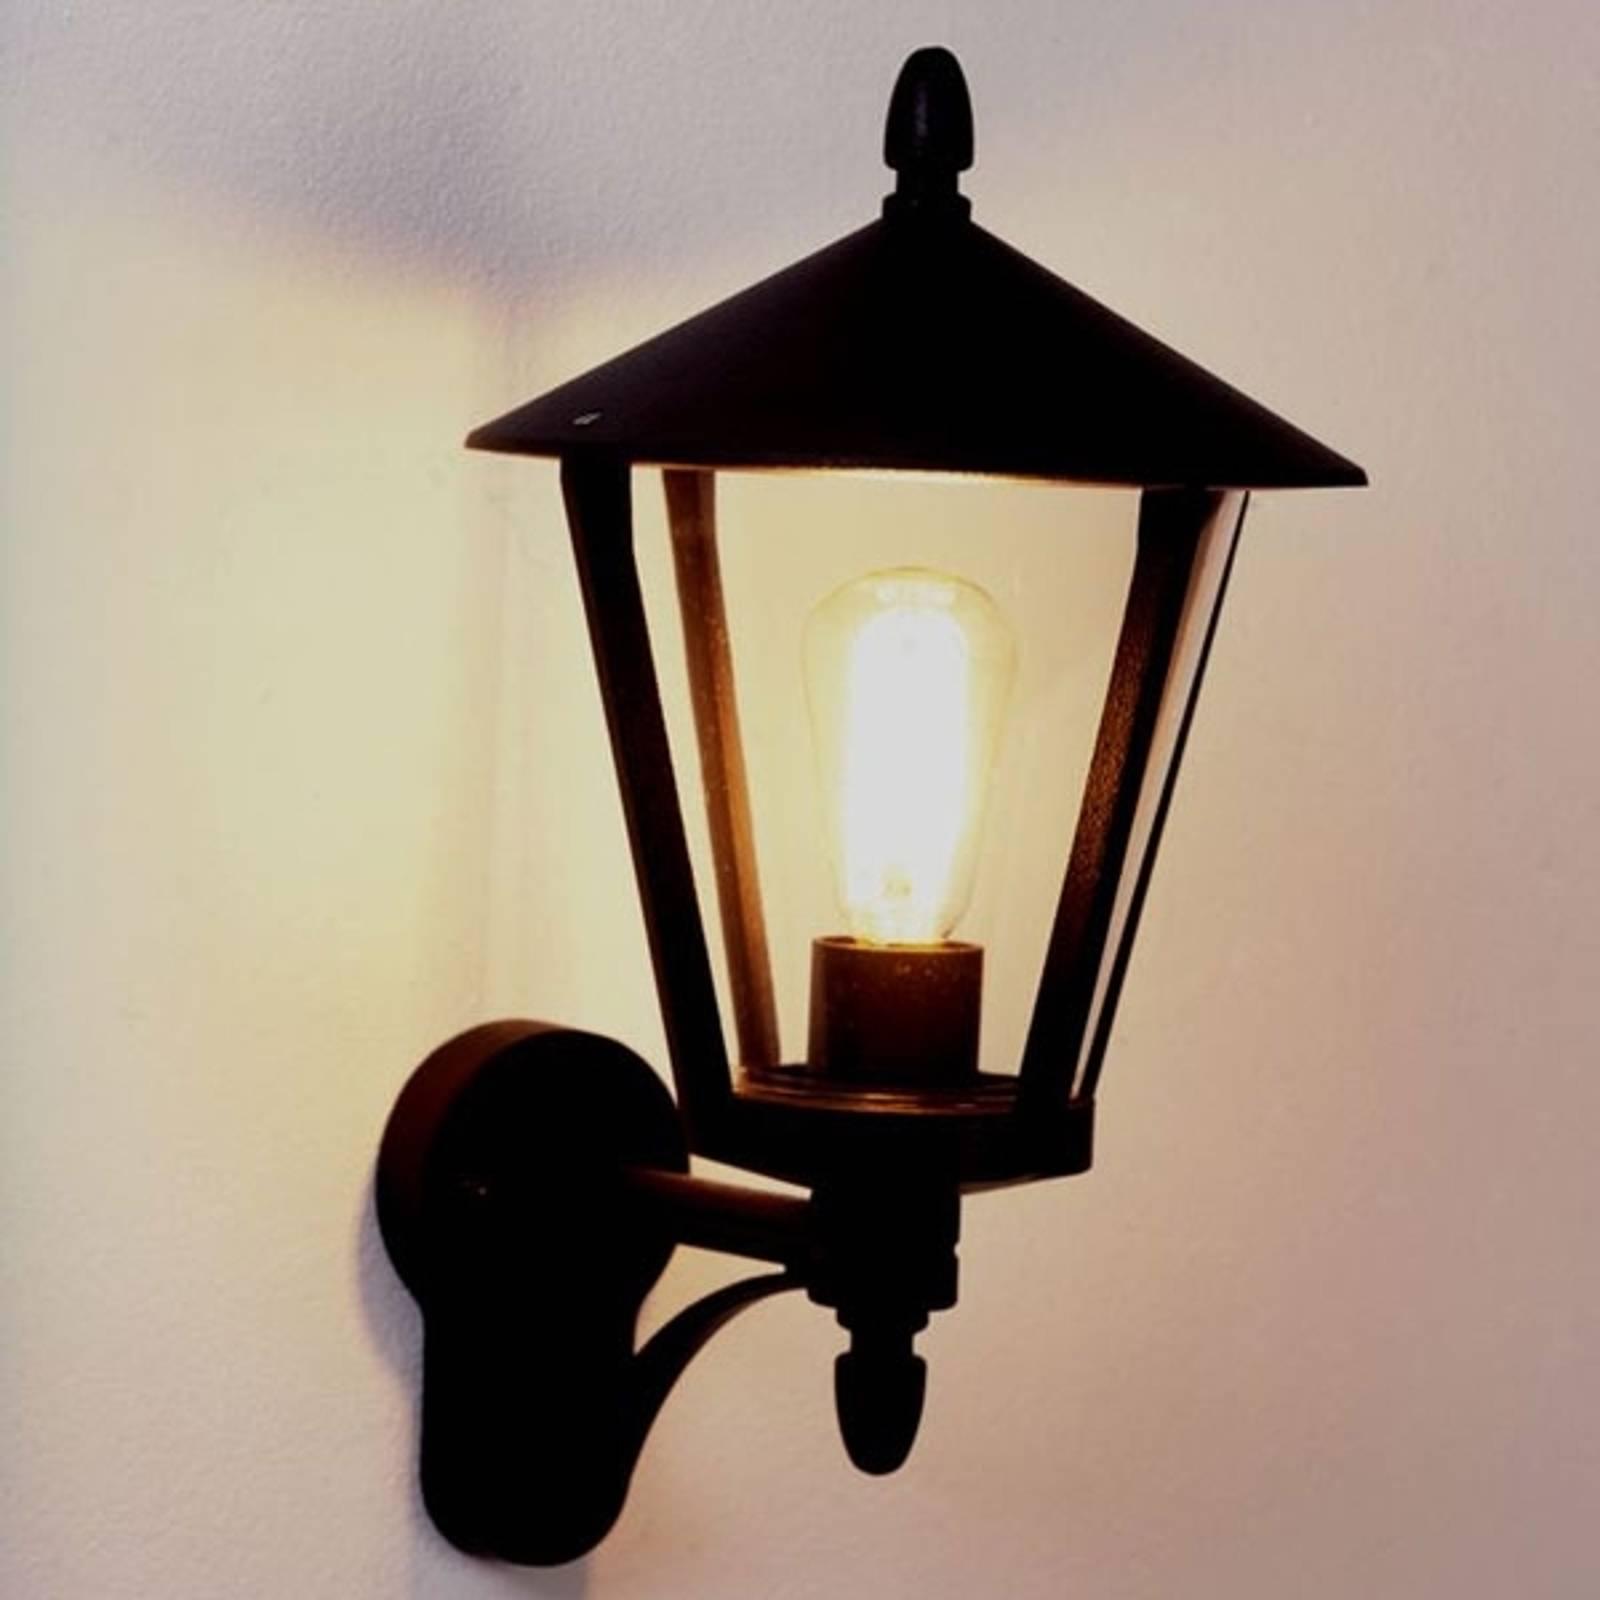 Stijlvolle buitenwandlamp 668 S